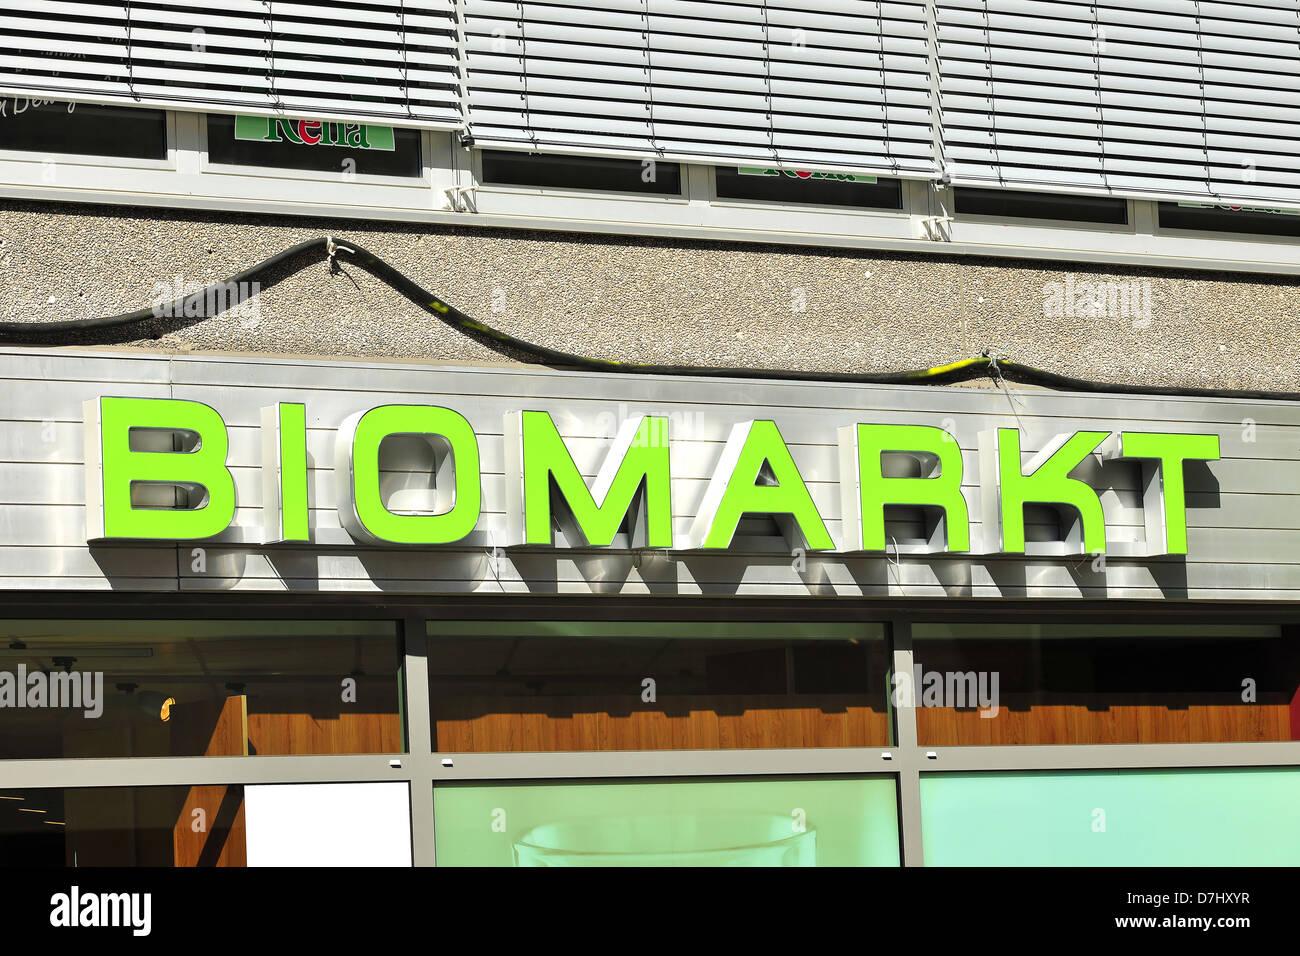 Companies, company signs, names, logo, Biomarkt - Stock Image